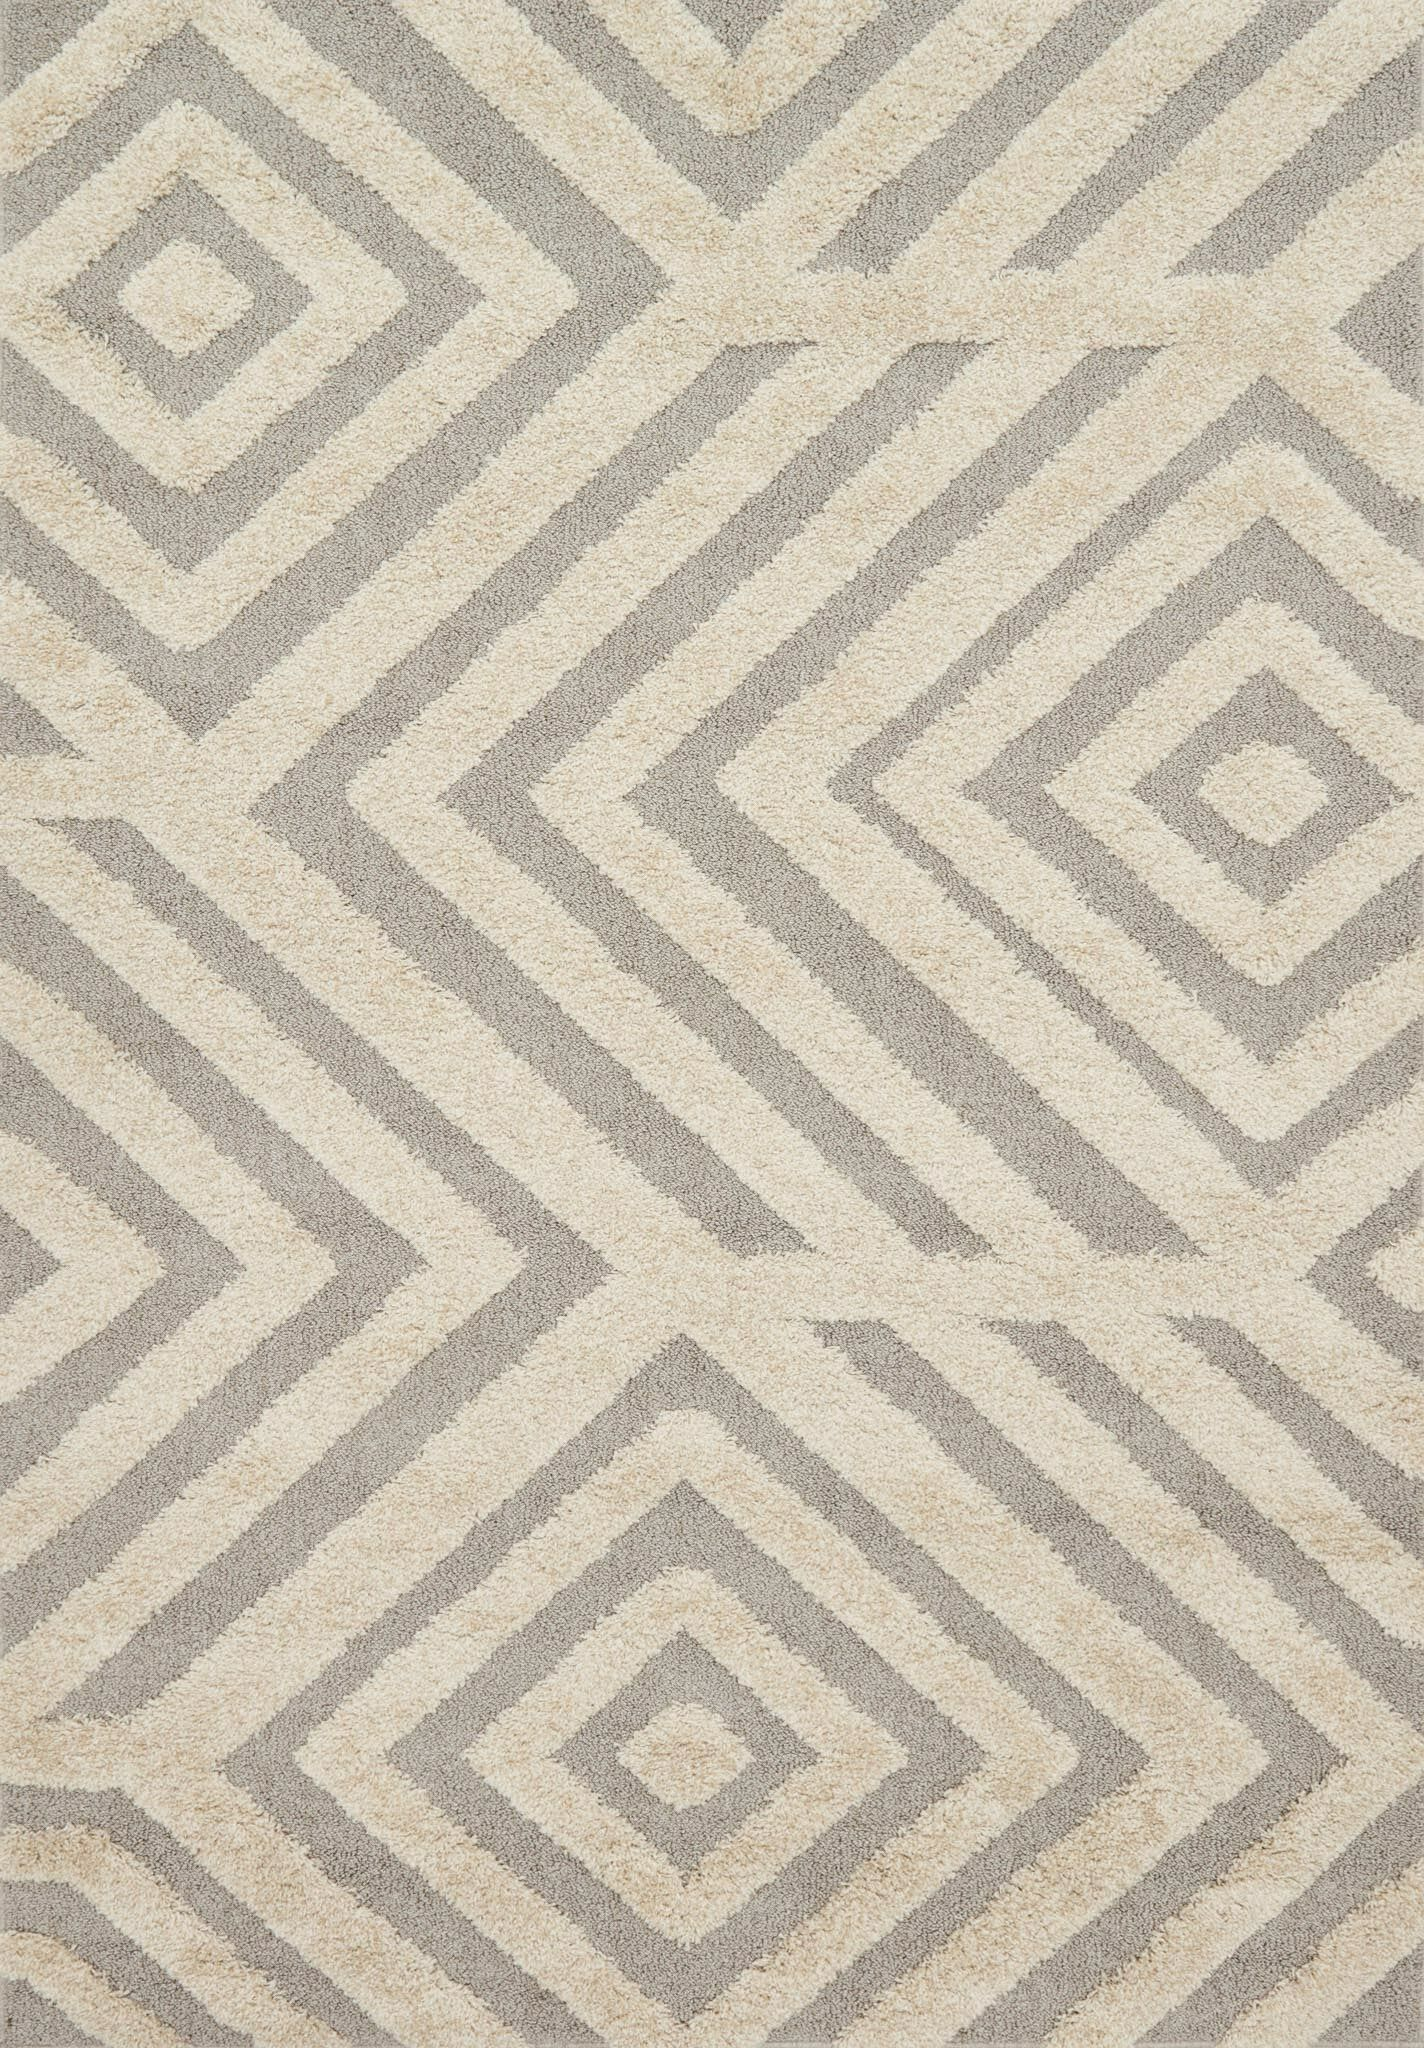 Bigham Sand/Gray Area Rug Rug Size: Rectangle 7'7